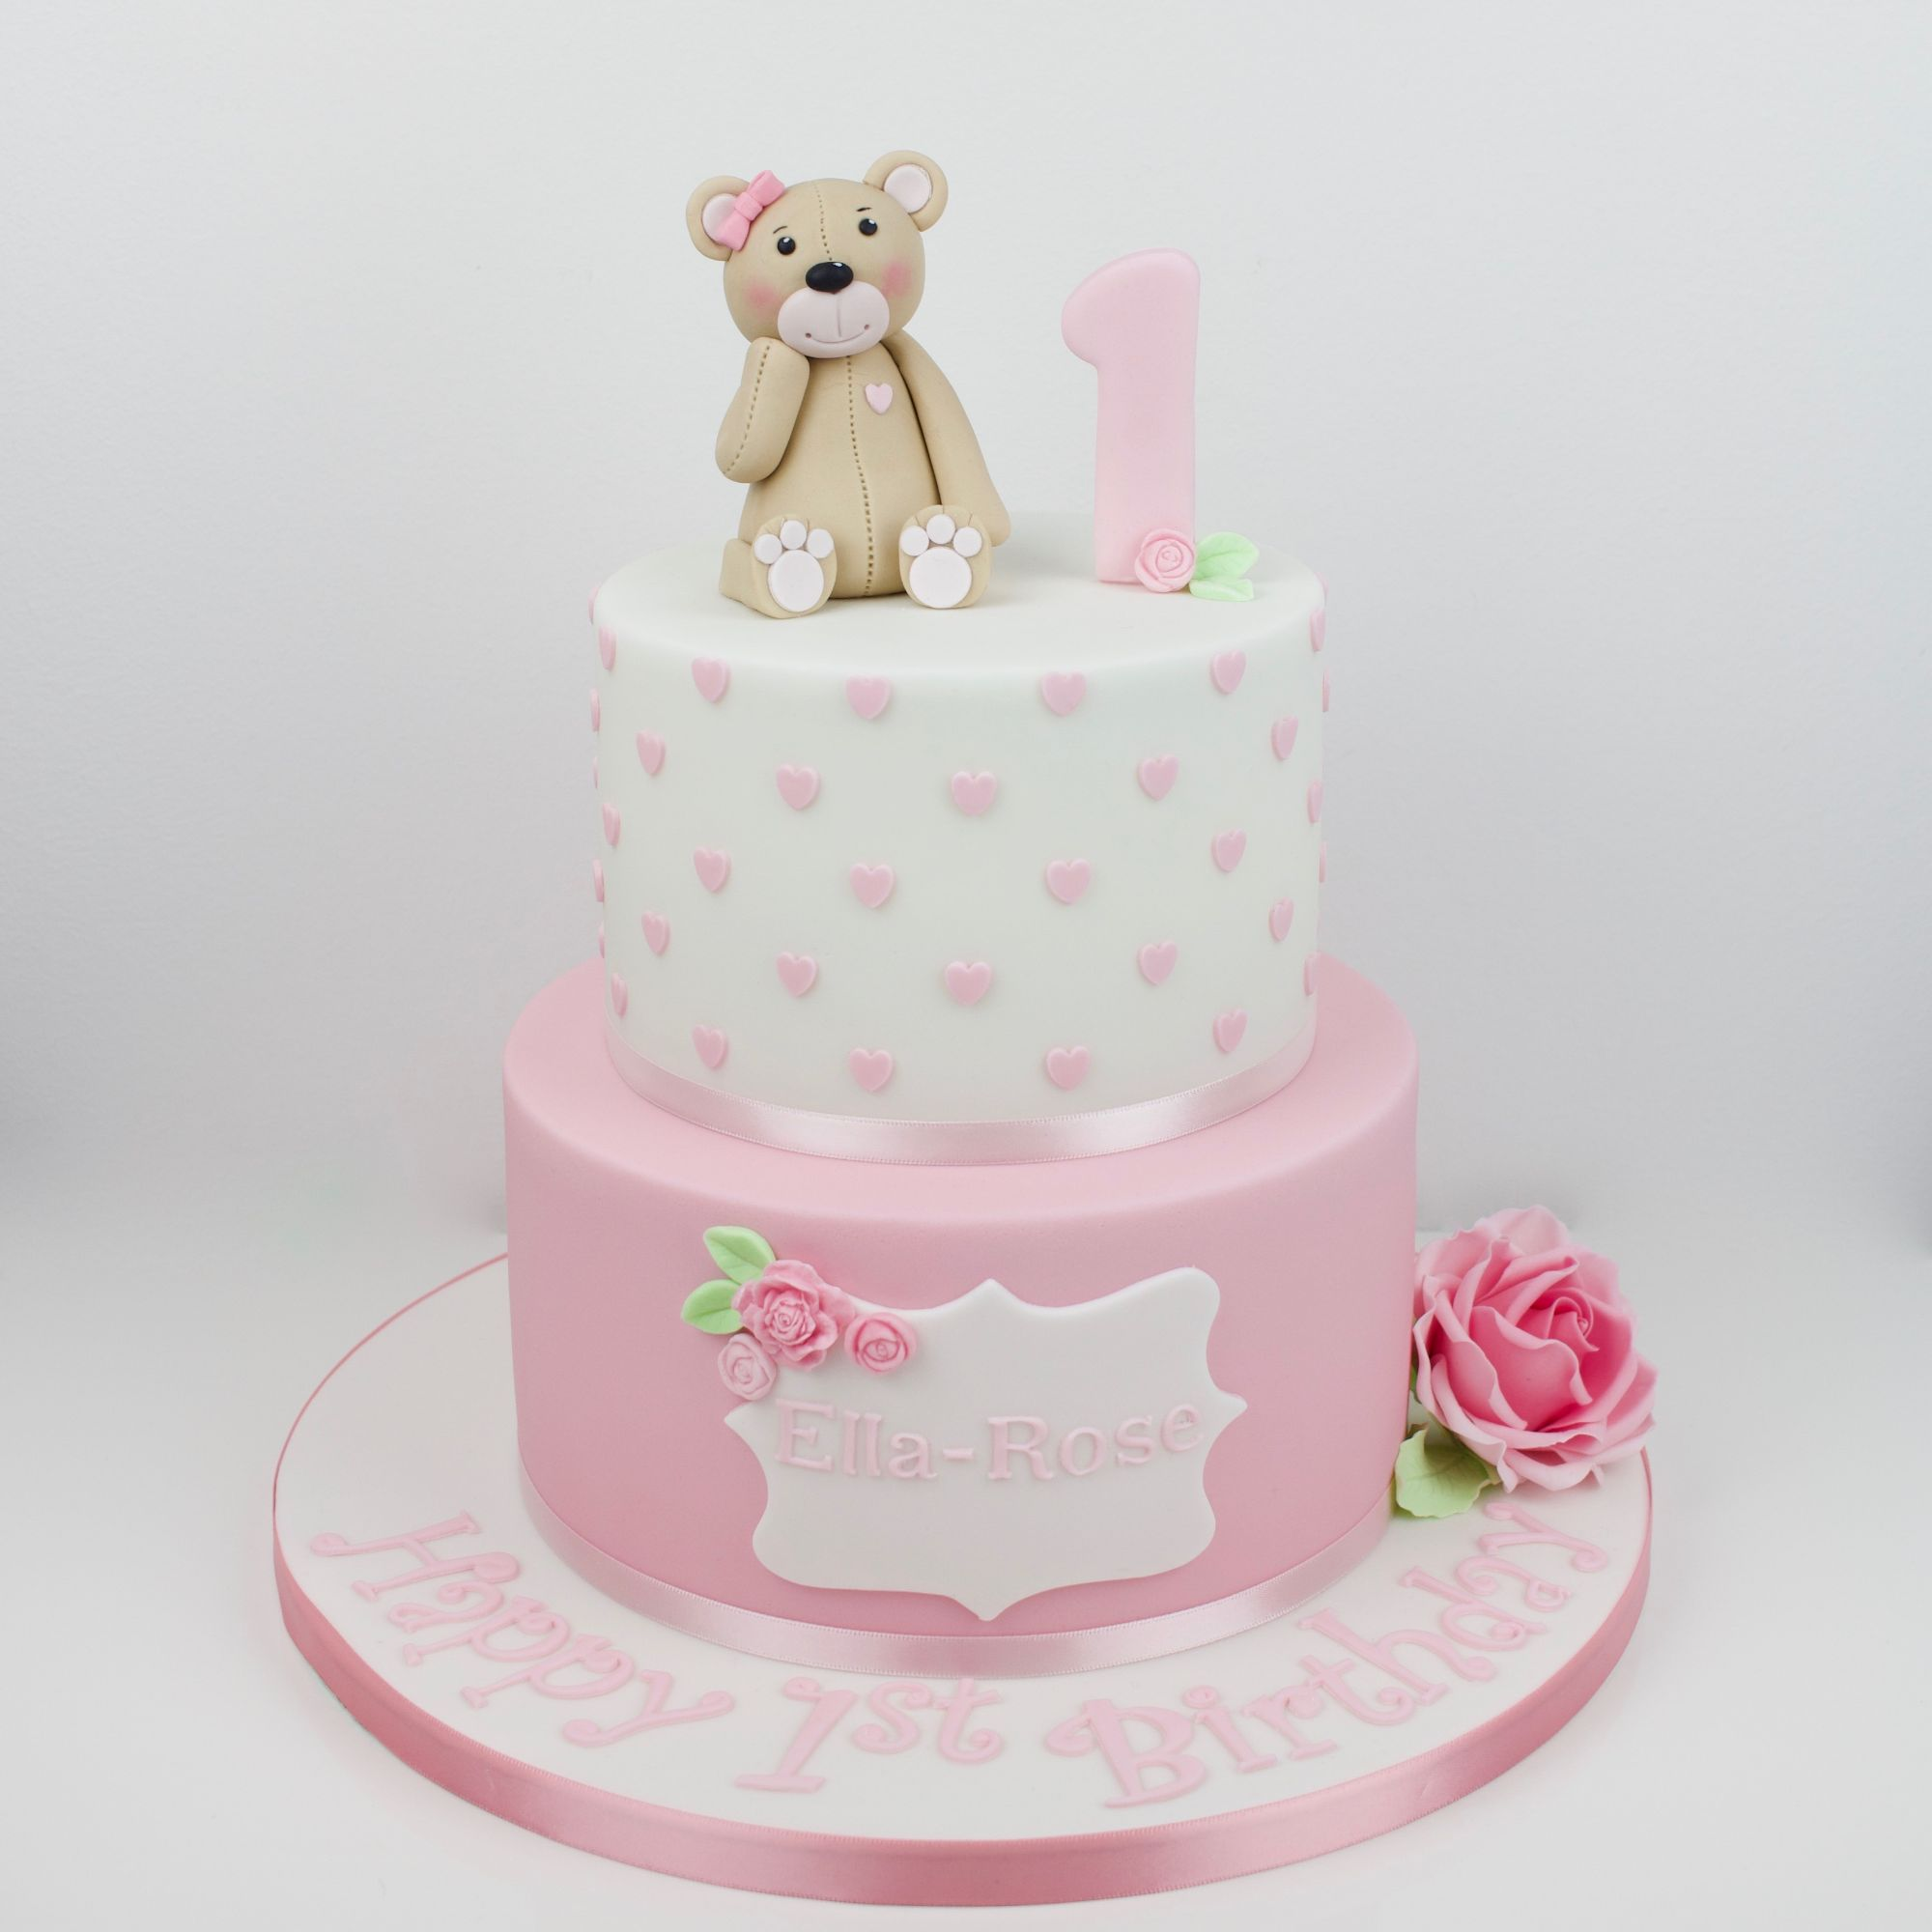 Teddy, rose cake